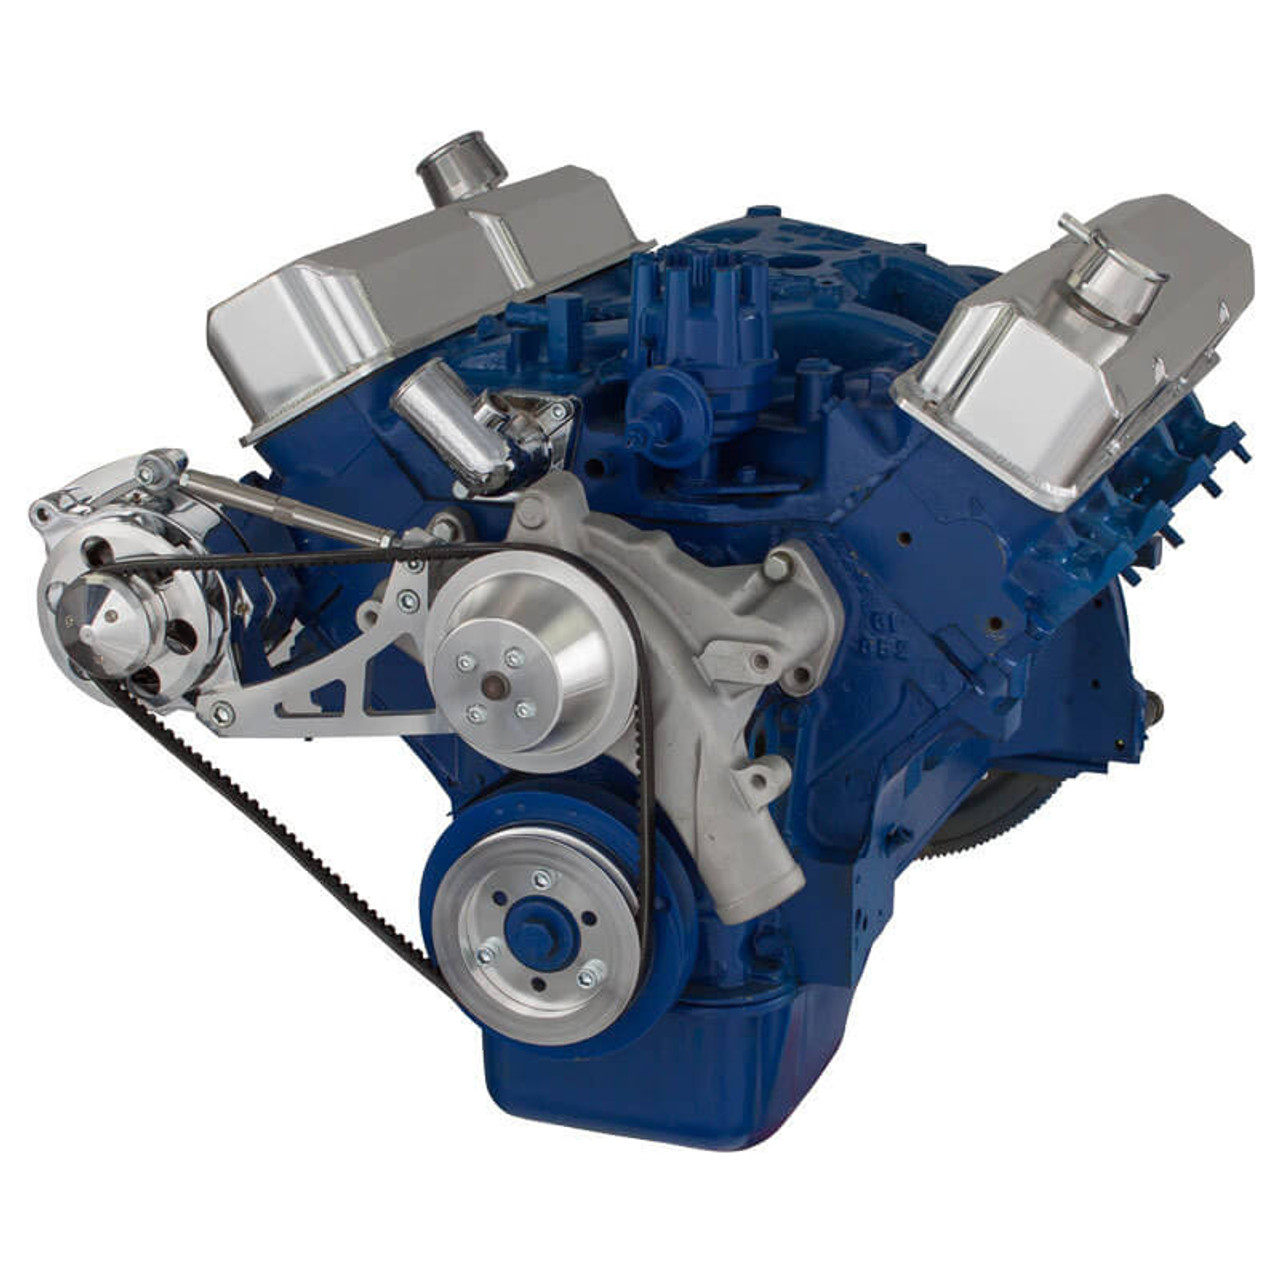 Ford 390 Fe Engine Vbelt Pulley System Alternatorrhcvfracing: Ford 390 Fe Engine Diagram At Gmaili.net